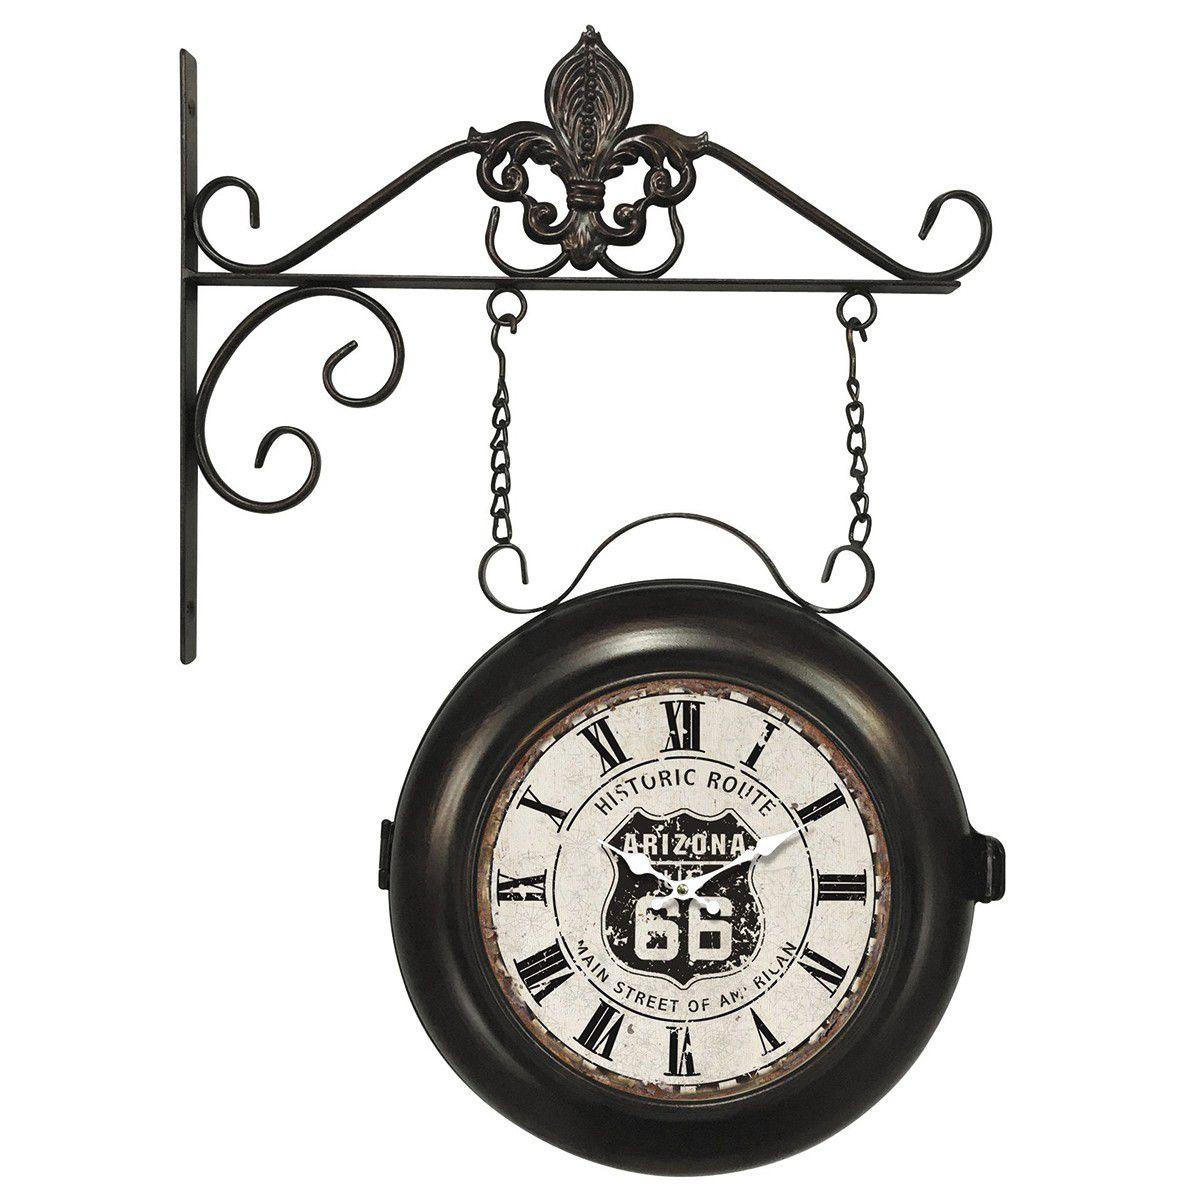 Relógio de parede dupla face c/ correntes Route 66